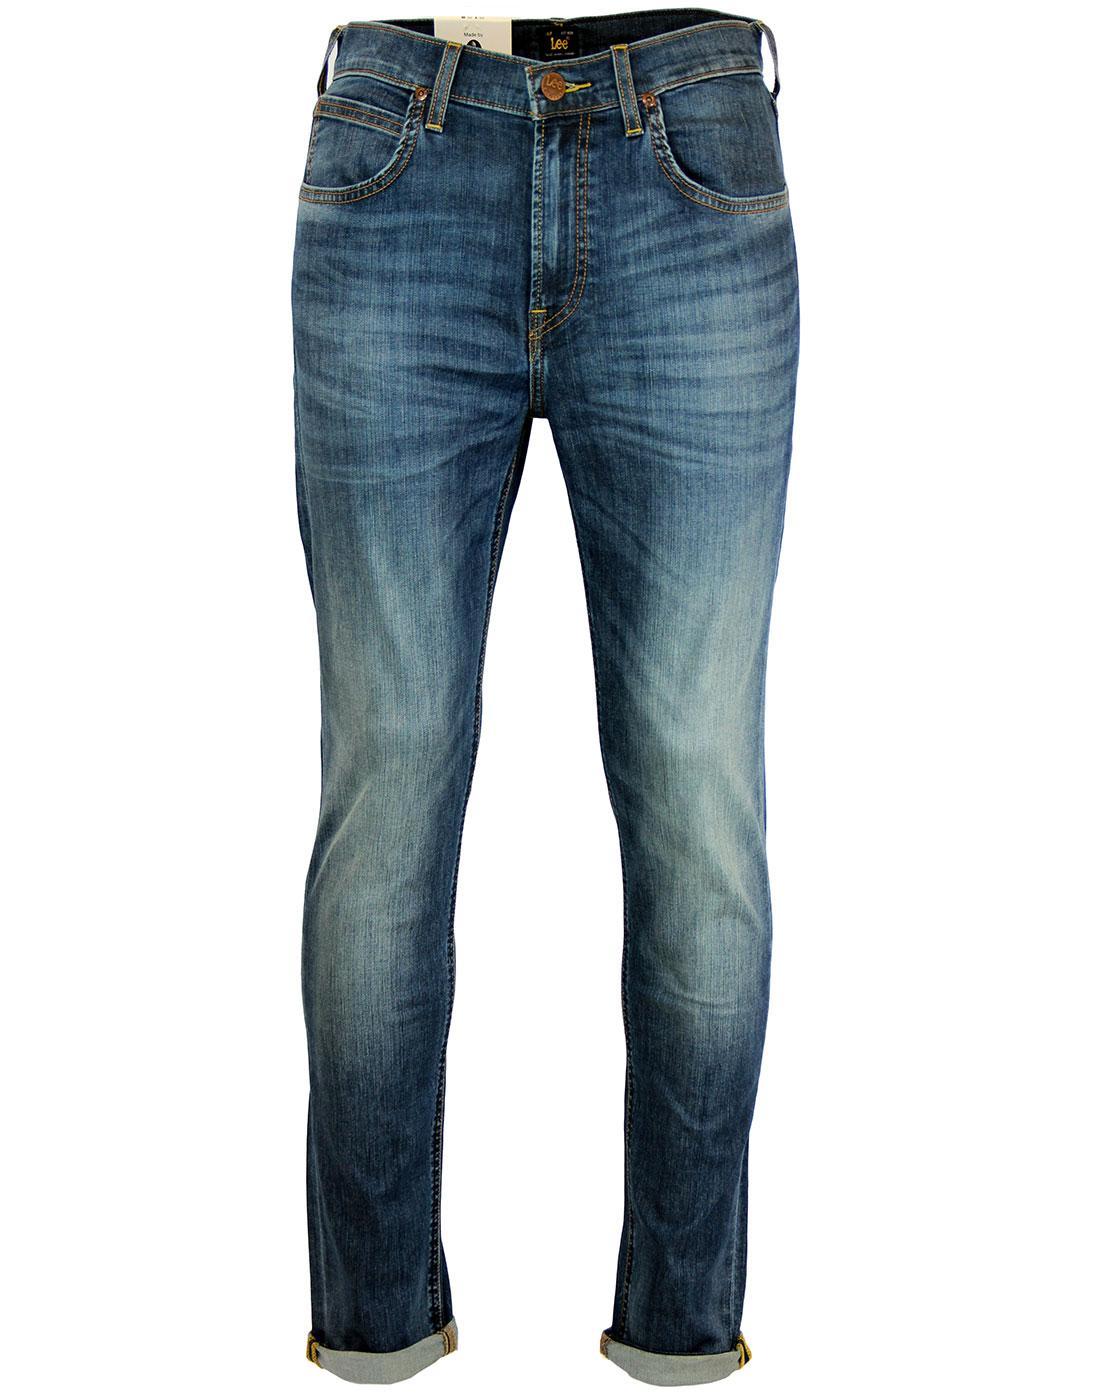 Arvin LEE Retro Blue Rhythm Regular Tapered Jeans